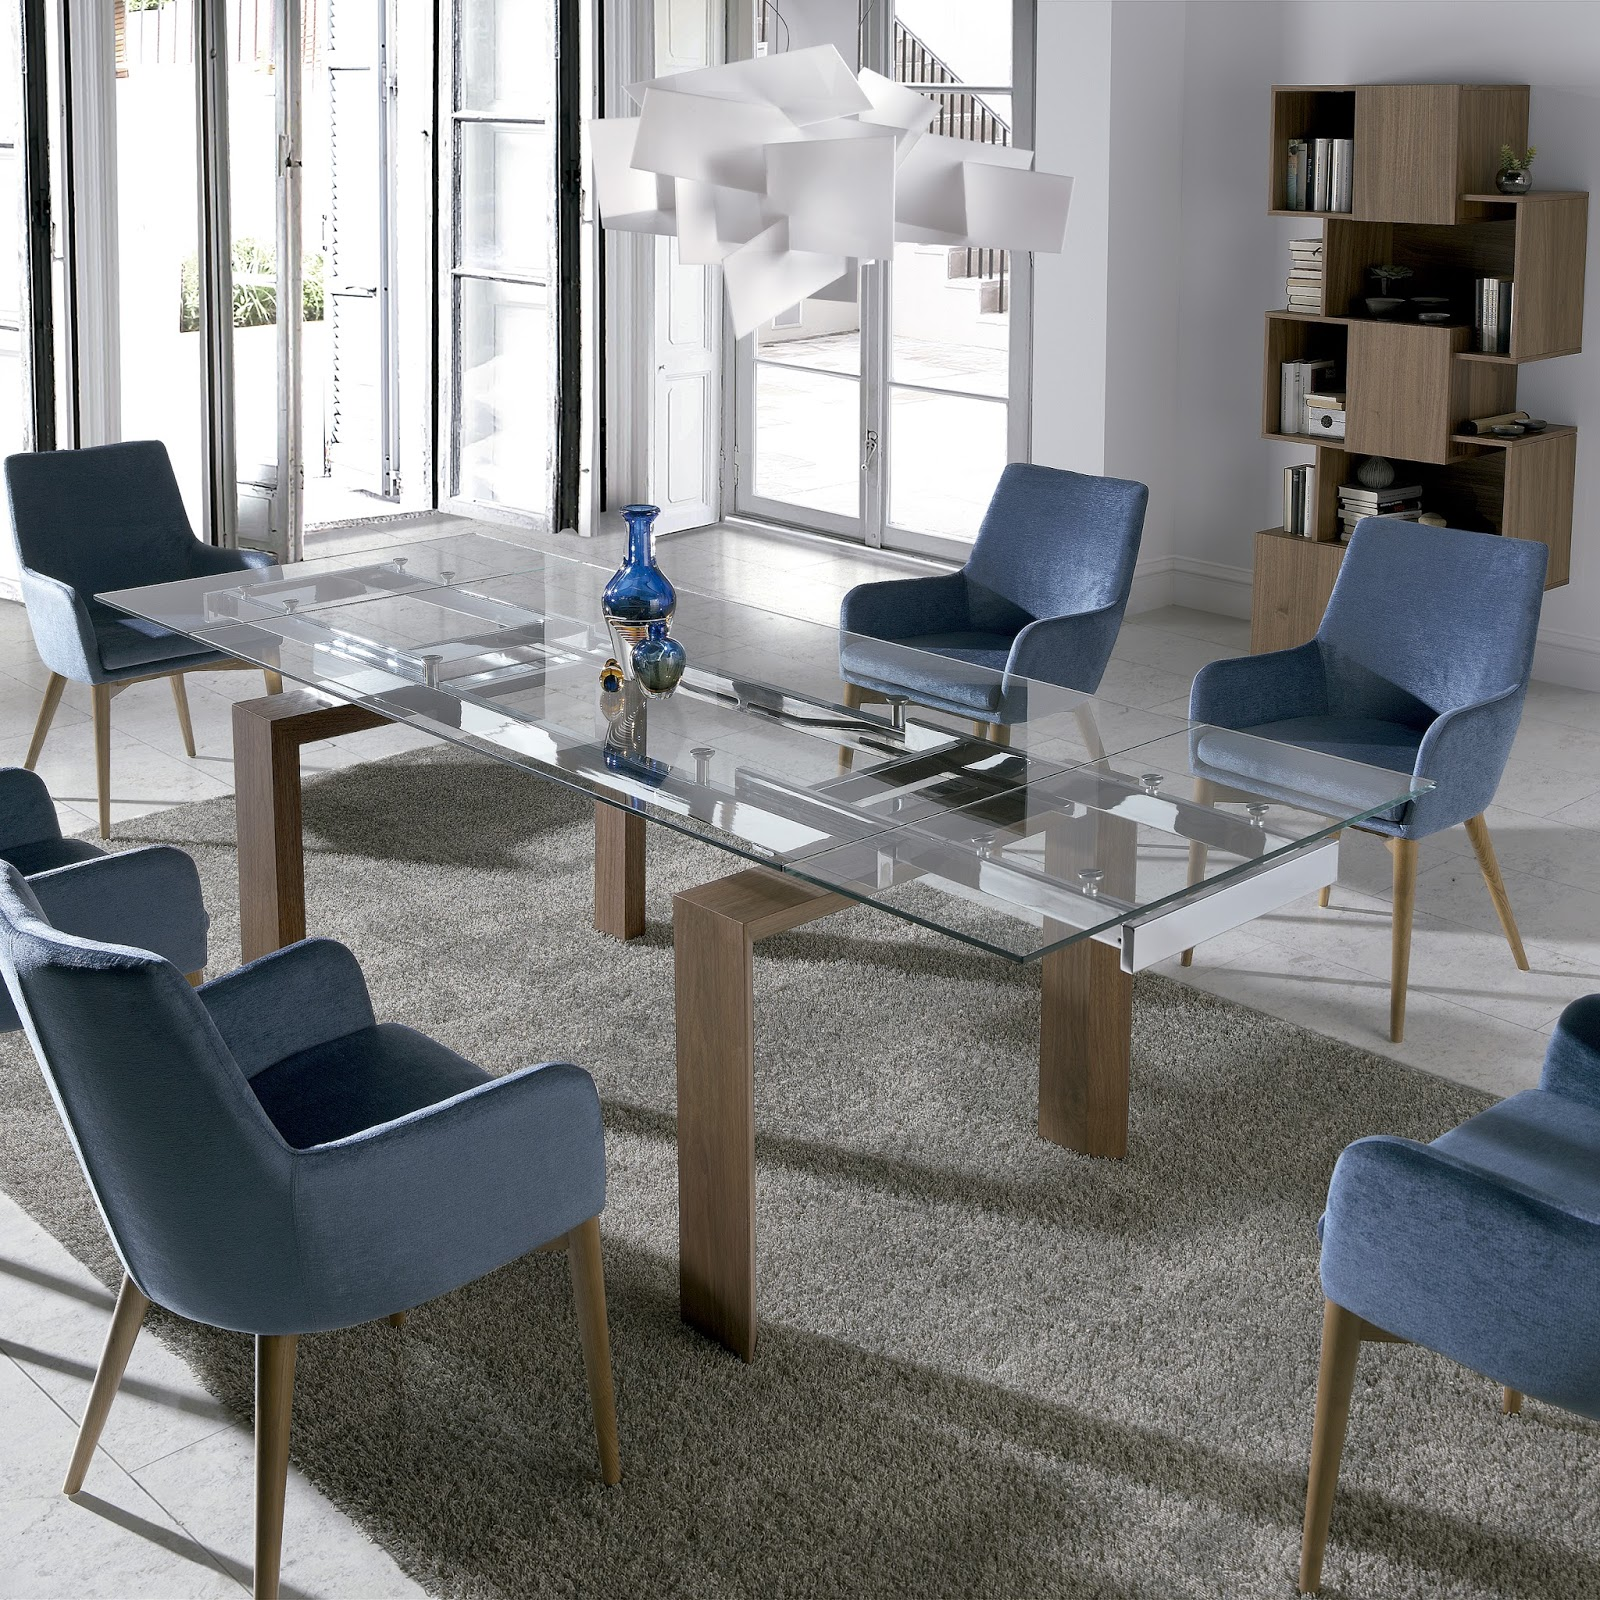 Mesas de comedor mesas de comedor extensibles de cristal - Mesas de comedor modernas de cristal ...